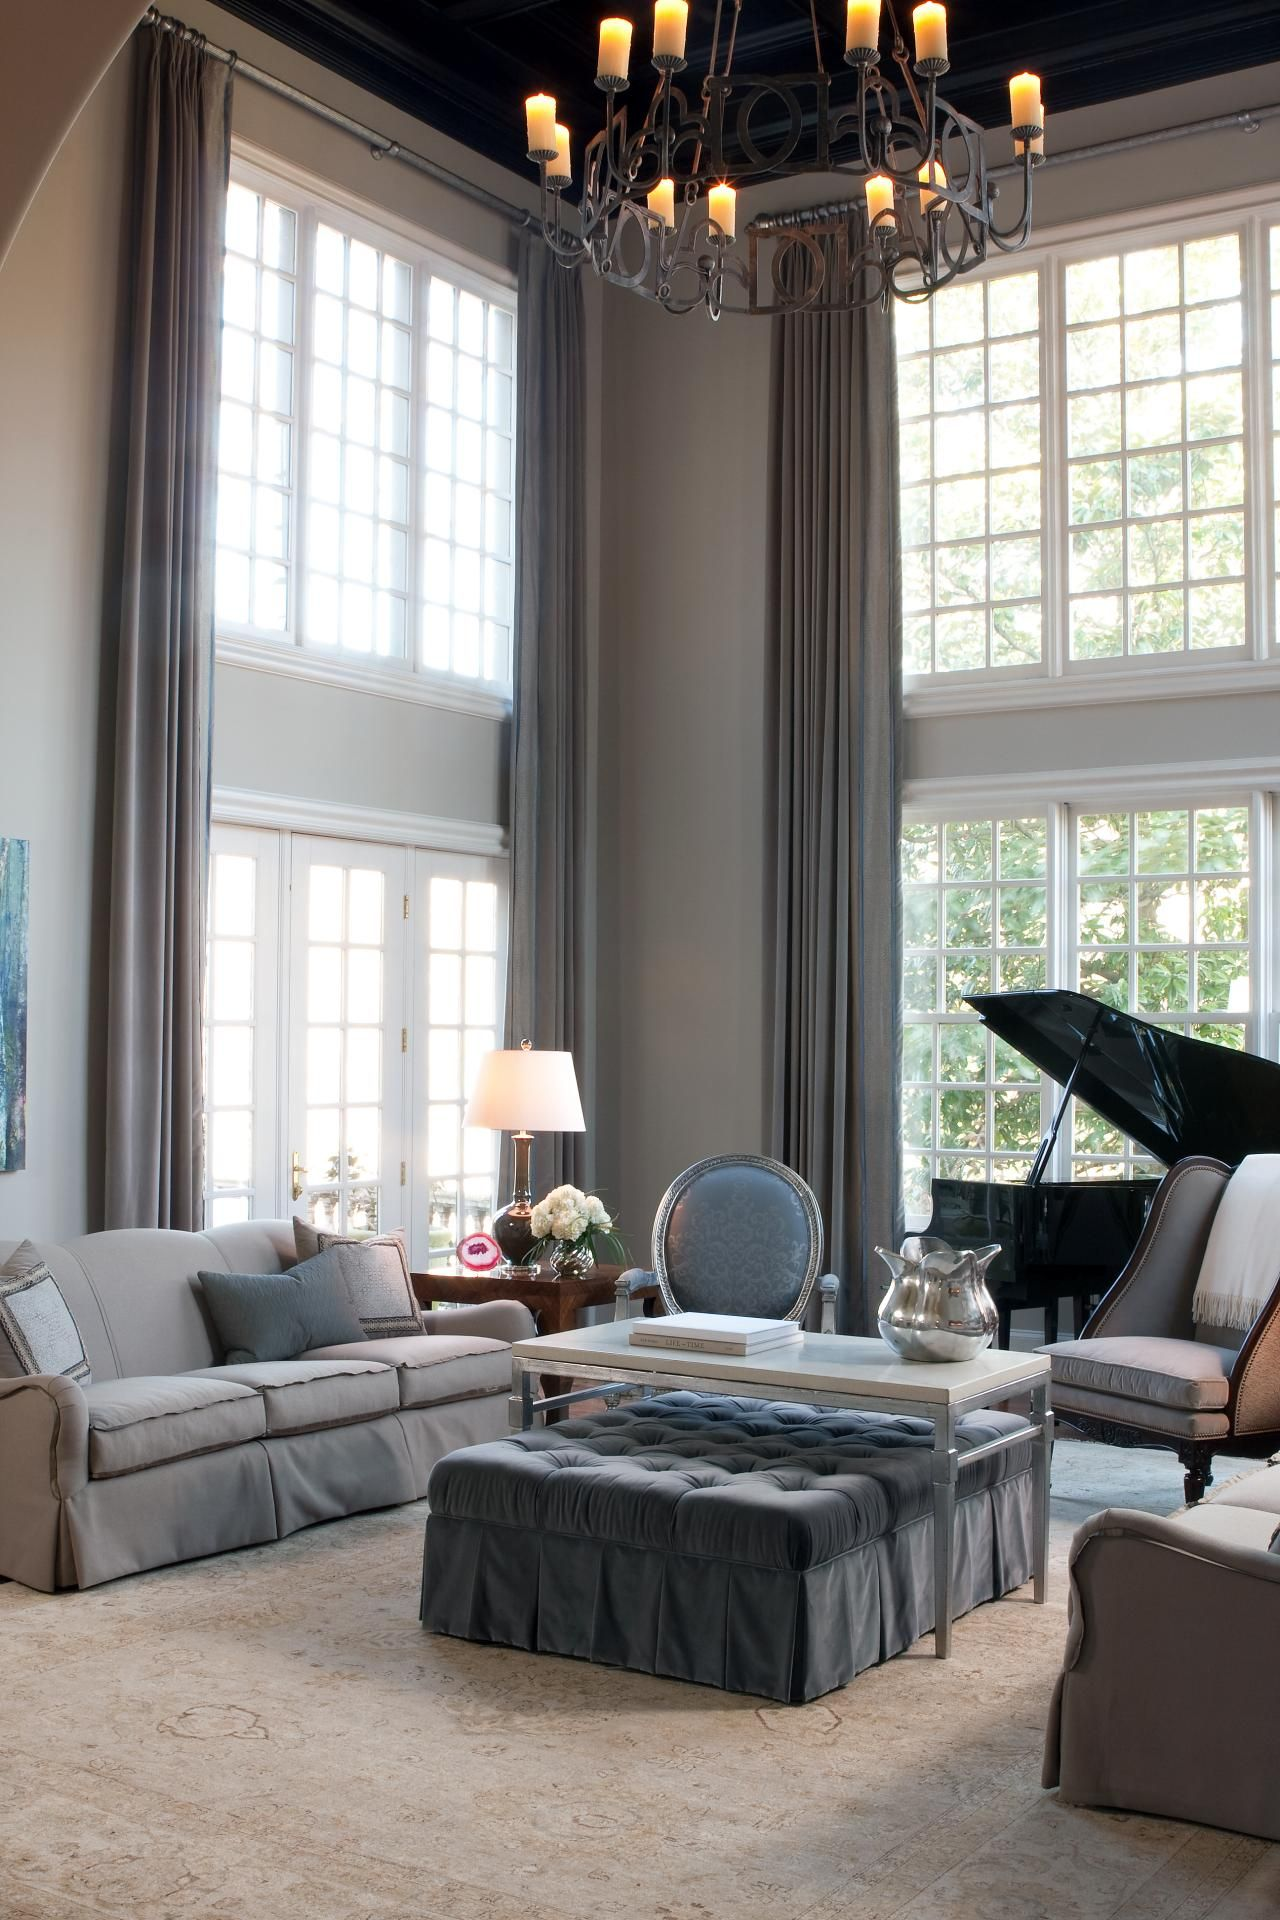 Window coverings for 2 story windows  rosemarie bryan hotwireenergy on pinterest